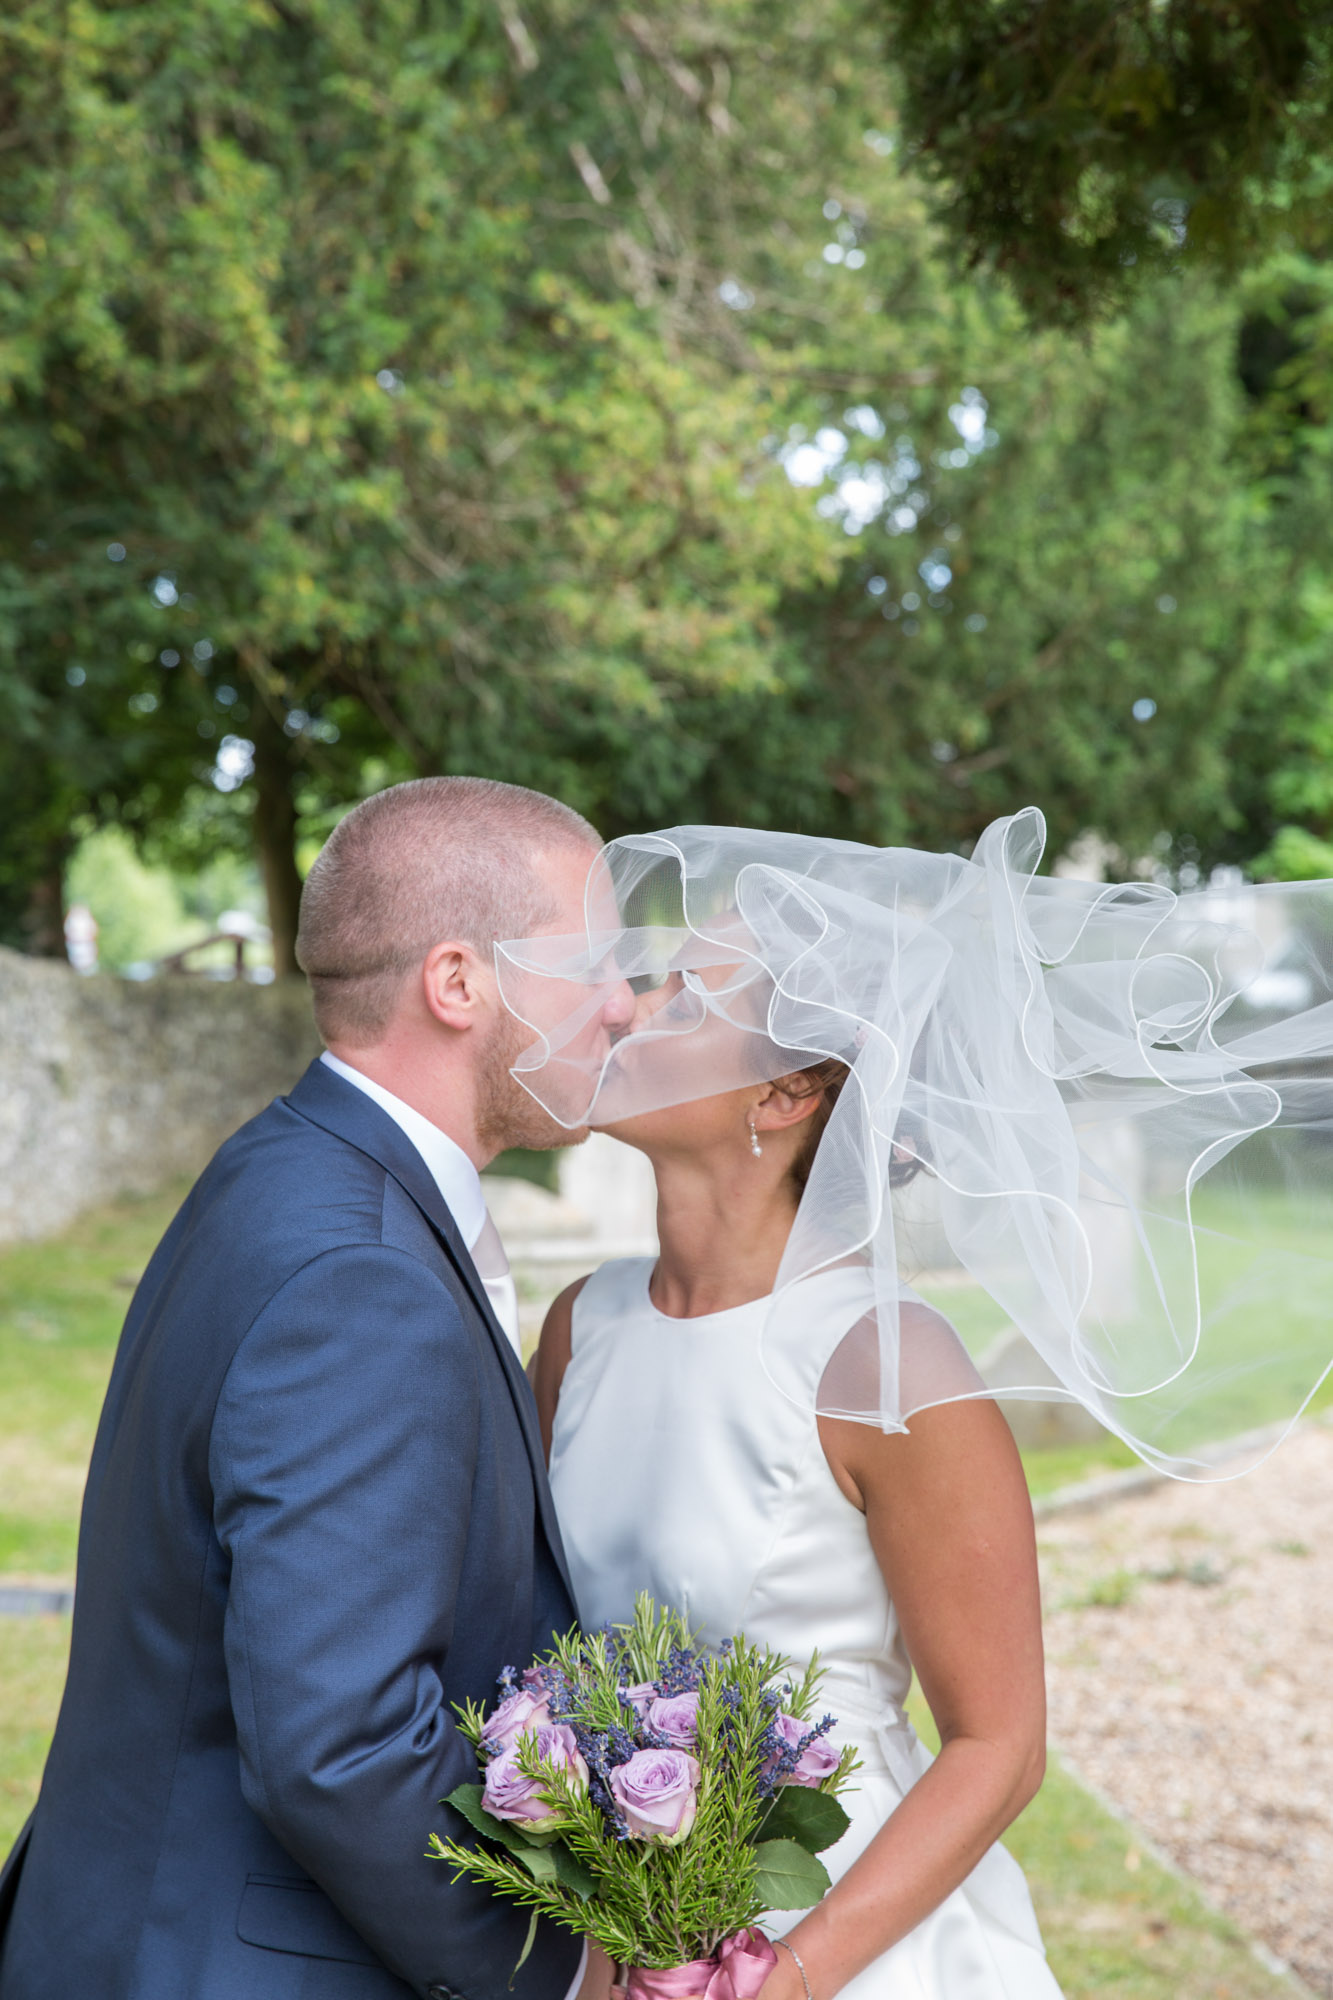 weddings-couples-love-photographer-oxford-london-jonathan-self-photography-72.jpg